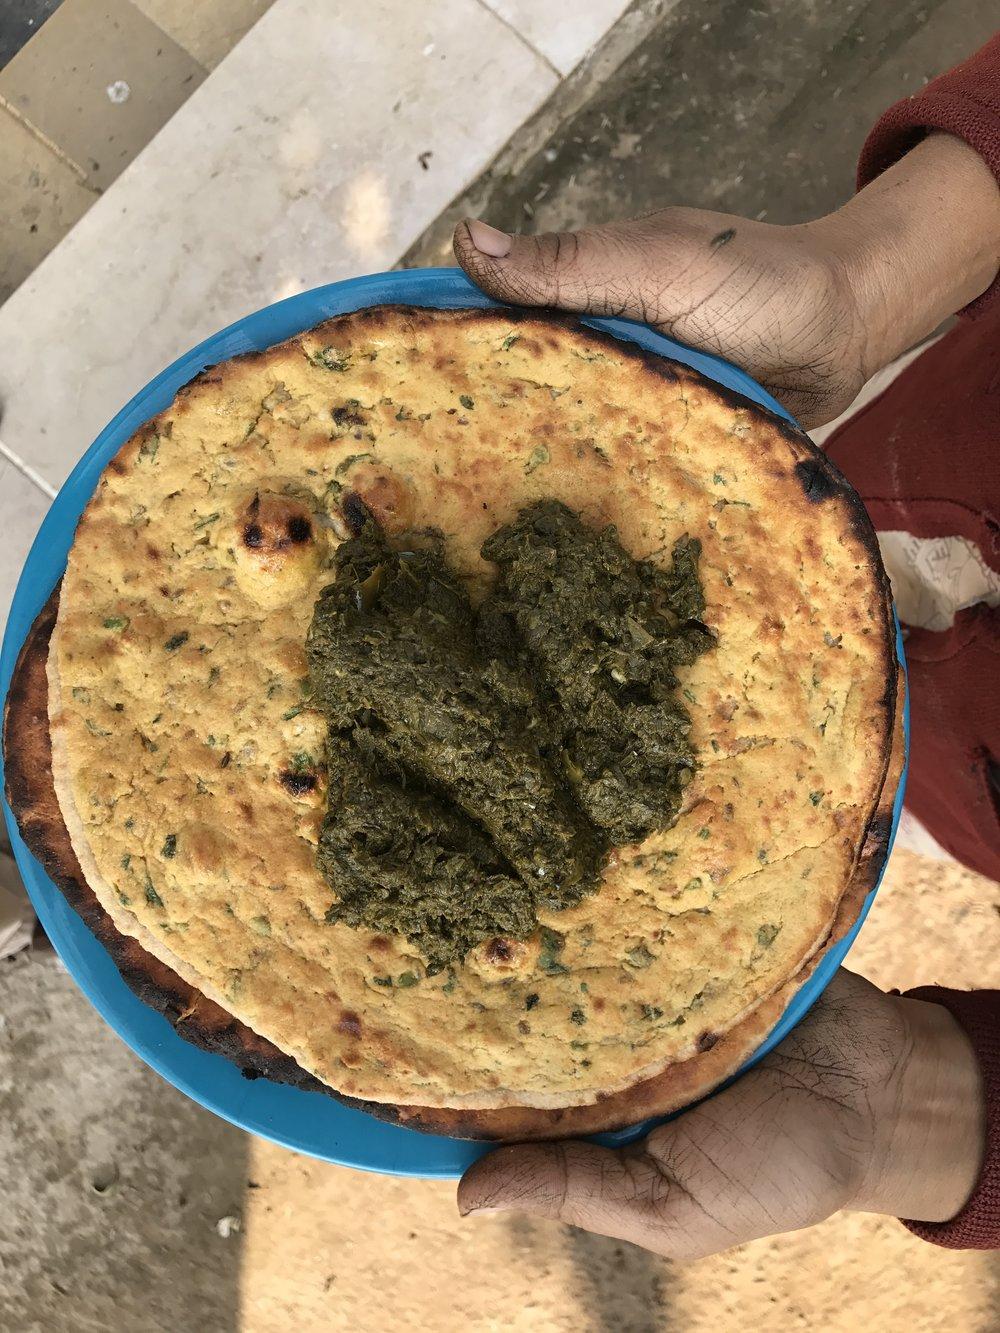 Khud EdTech Lahore Pakistan - Farm to Table - Sarson ka Saag Mikai Ki Roti - Mustard Desi Corn Bread.JPG